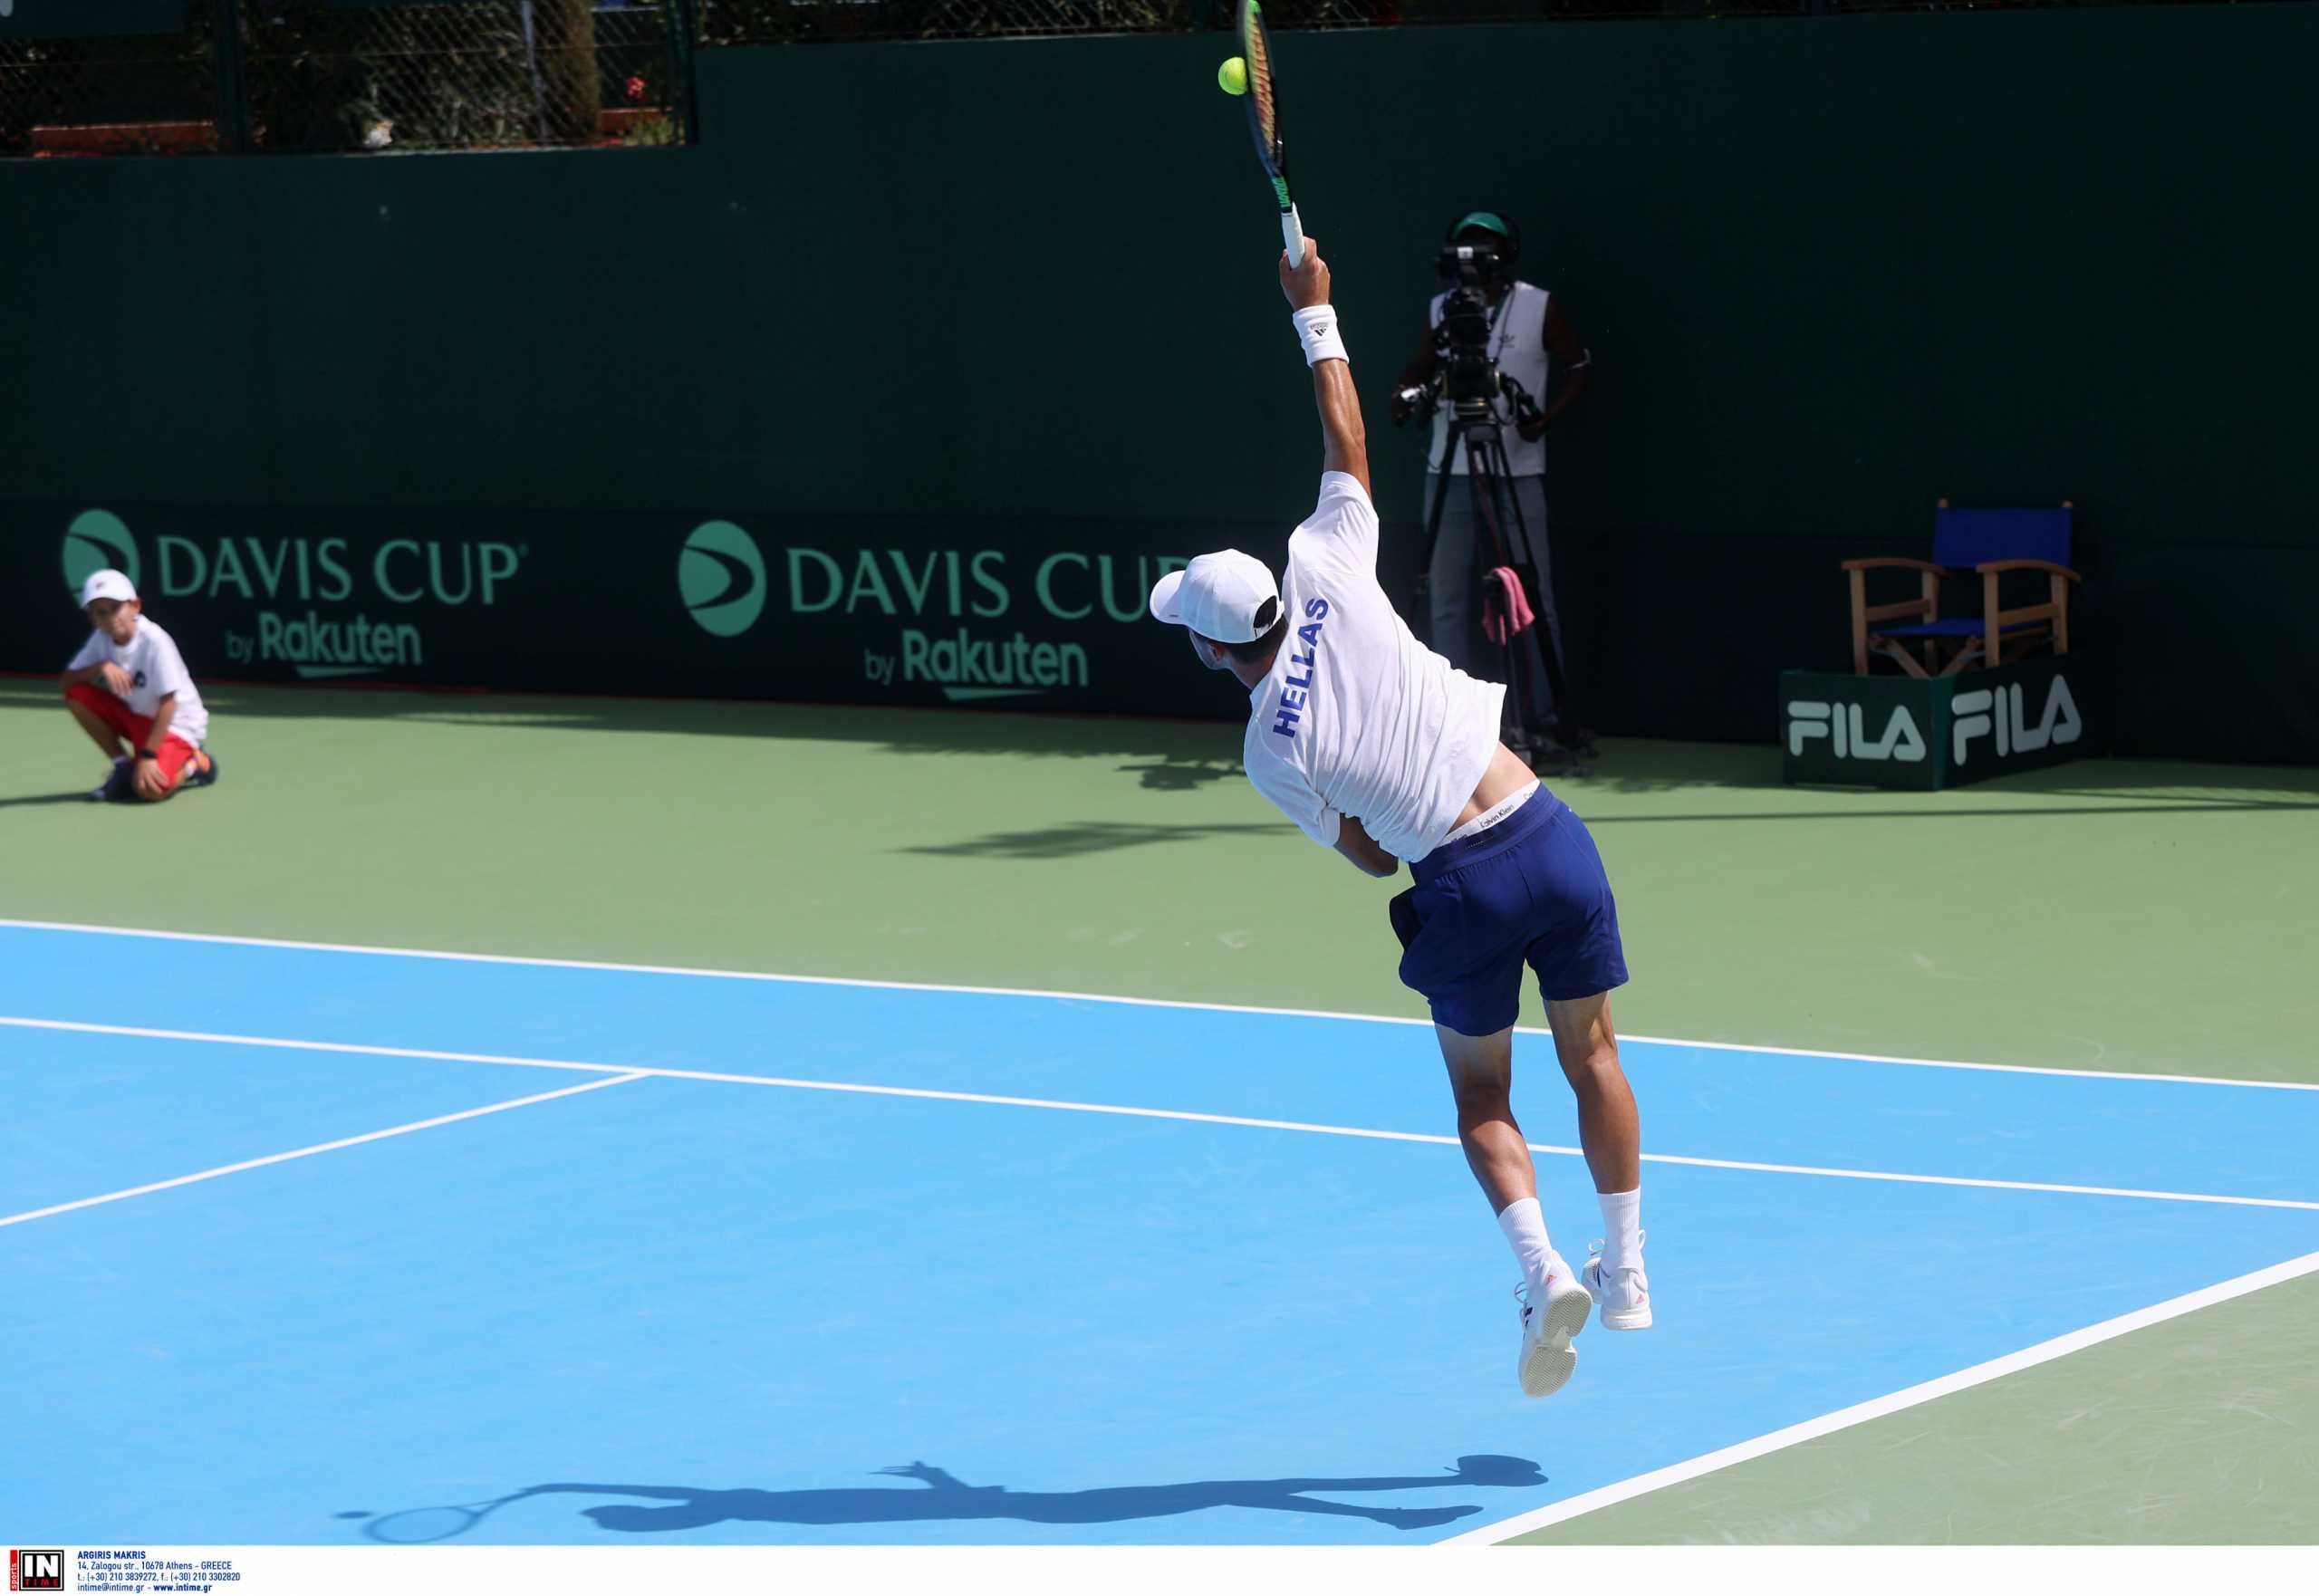 Davis Cup: Ηττήθηκε και ο Περβολαράκης – Με την πλάτη στον τοίχο η Ελλάδα